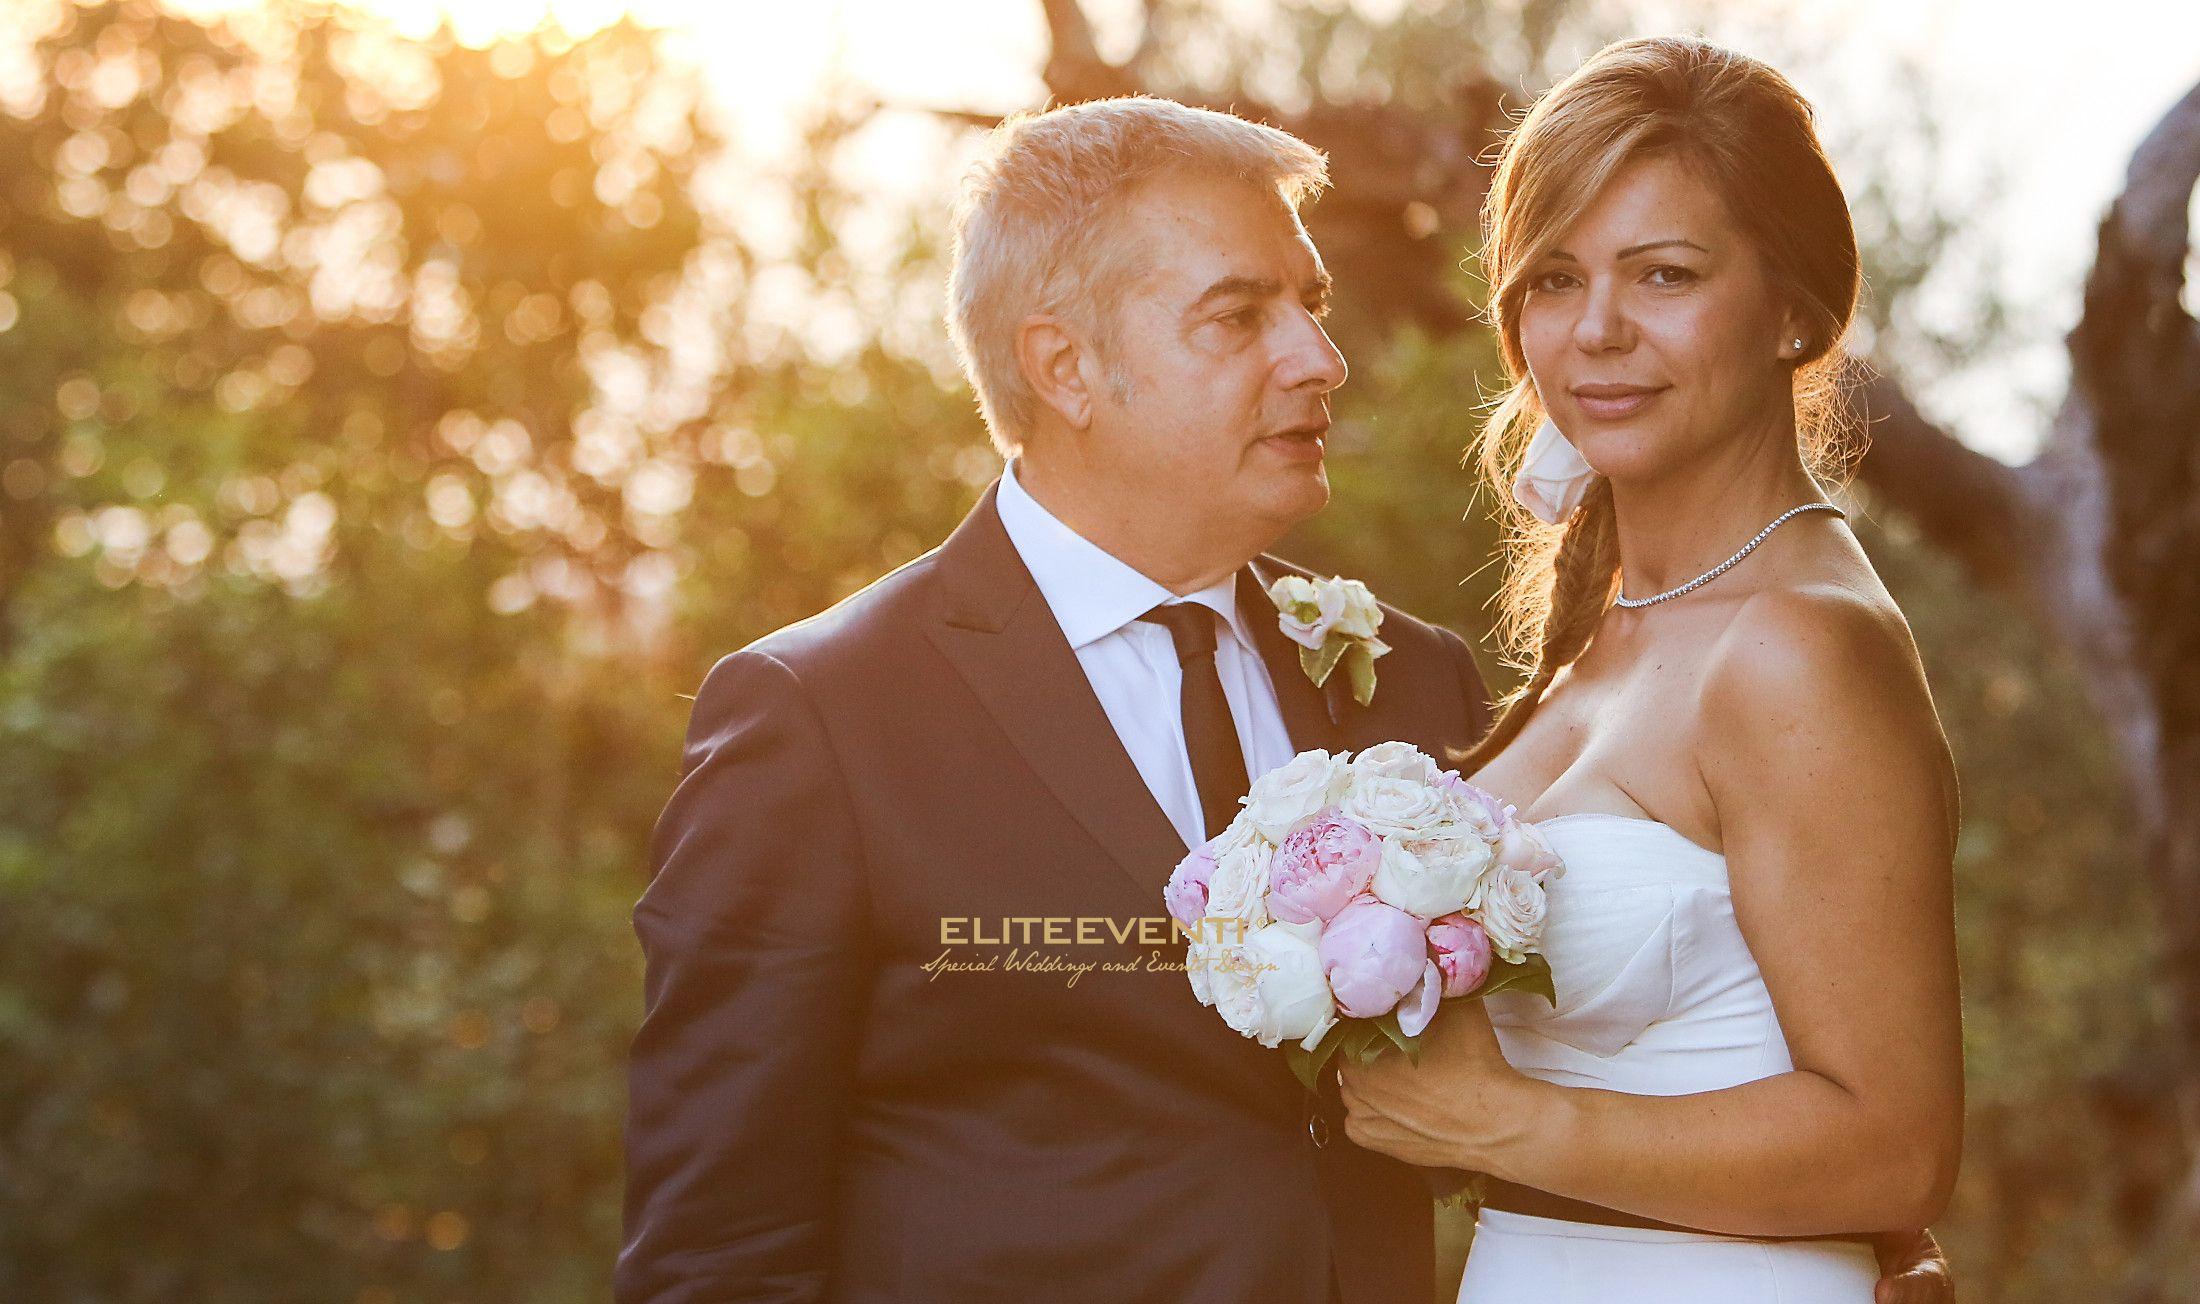 Atmosfere_matrimonio_in_Toscana_By_Eliteeventi